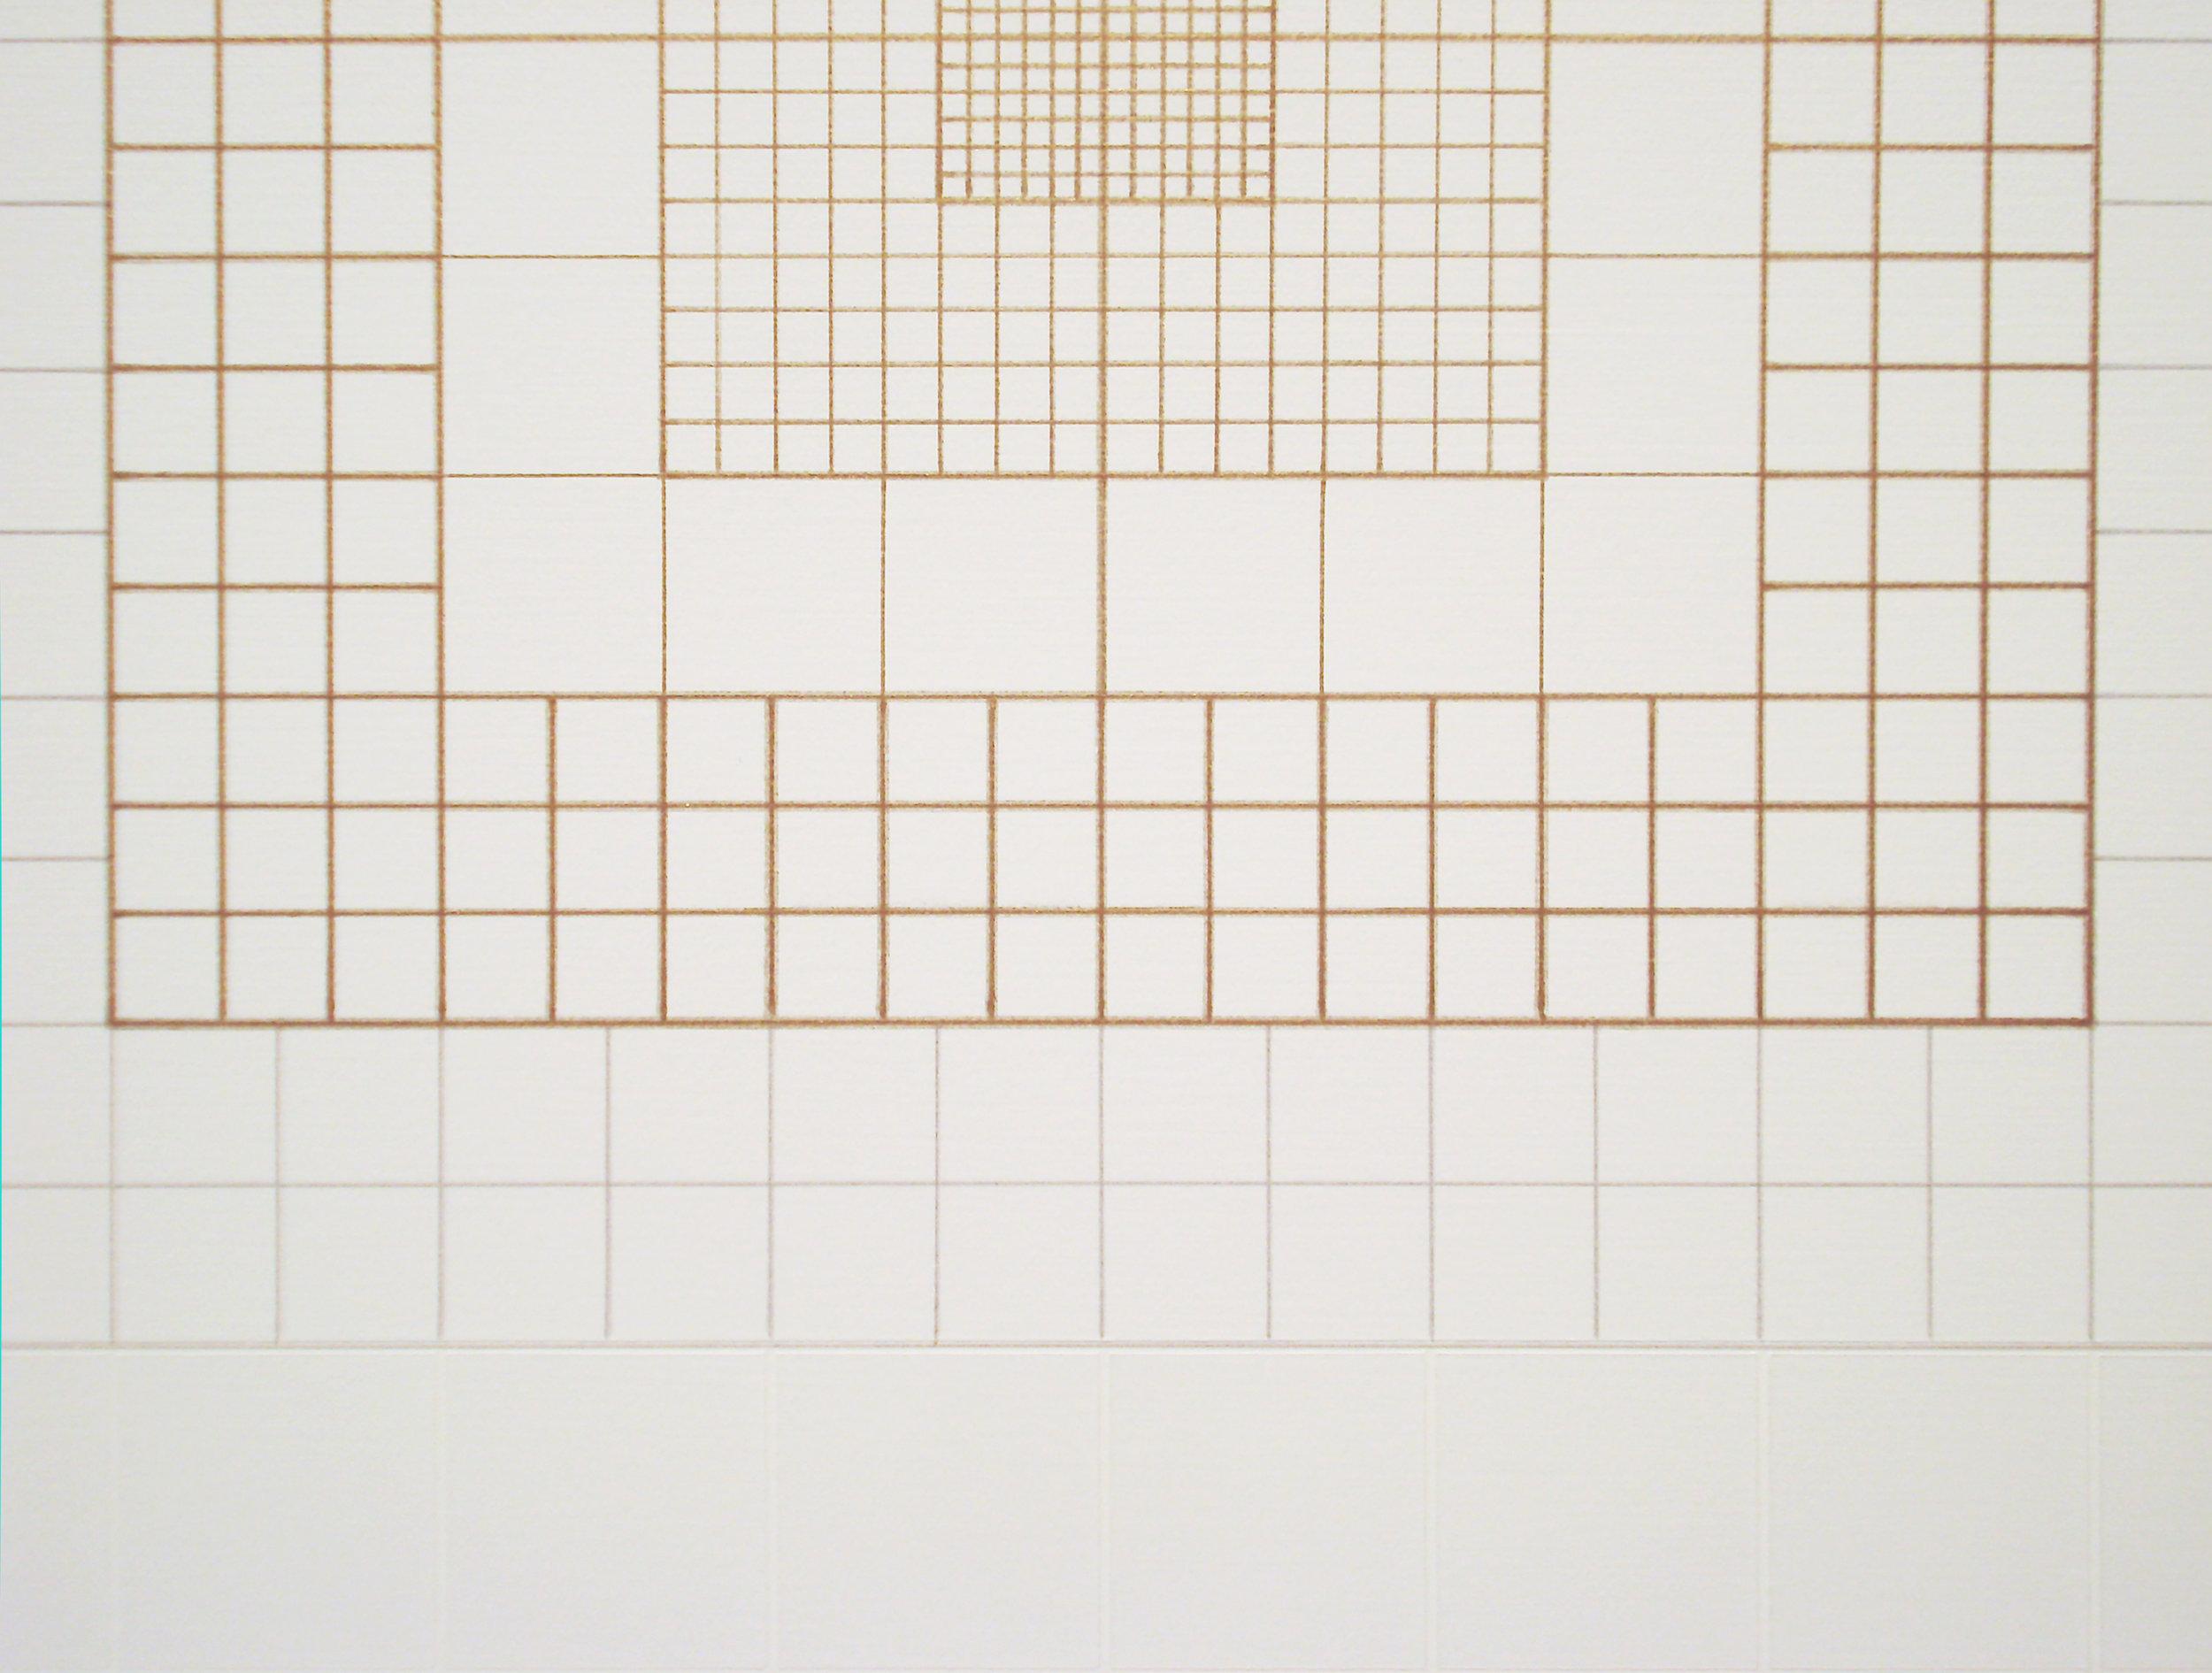 Yantra-origo-metrum [20180512]_2018_acrylic-on-canvas_29 1-2x23 5-8 in.[75x60cm]-4.jpg